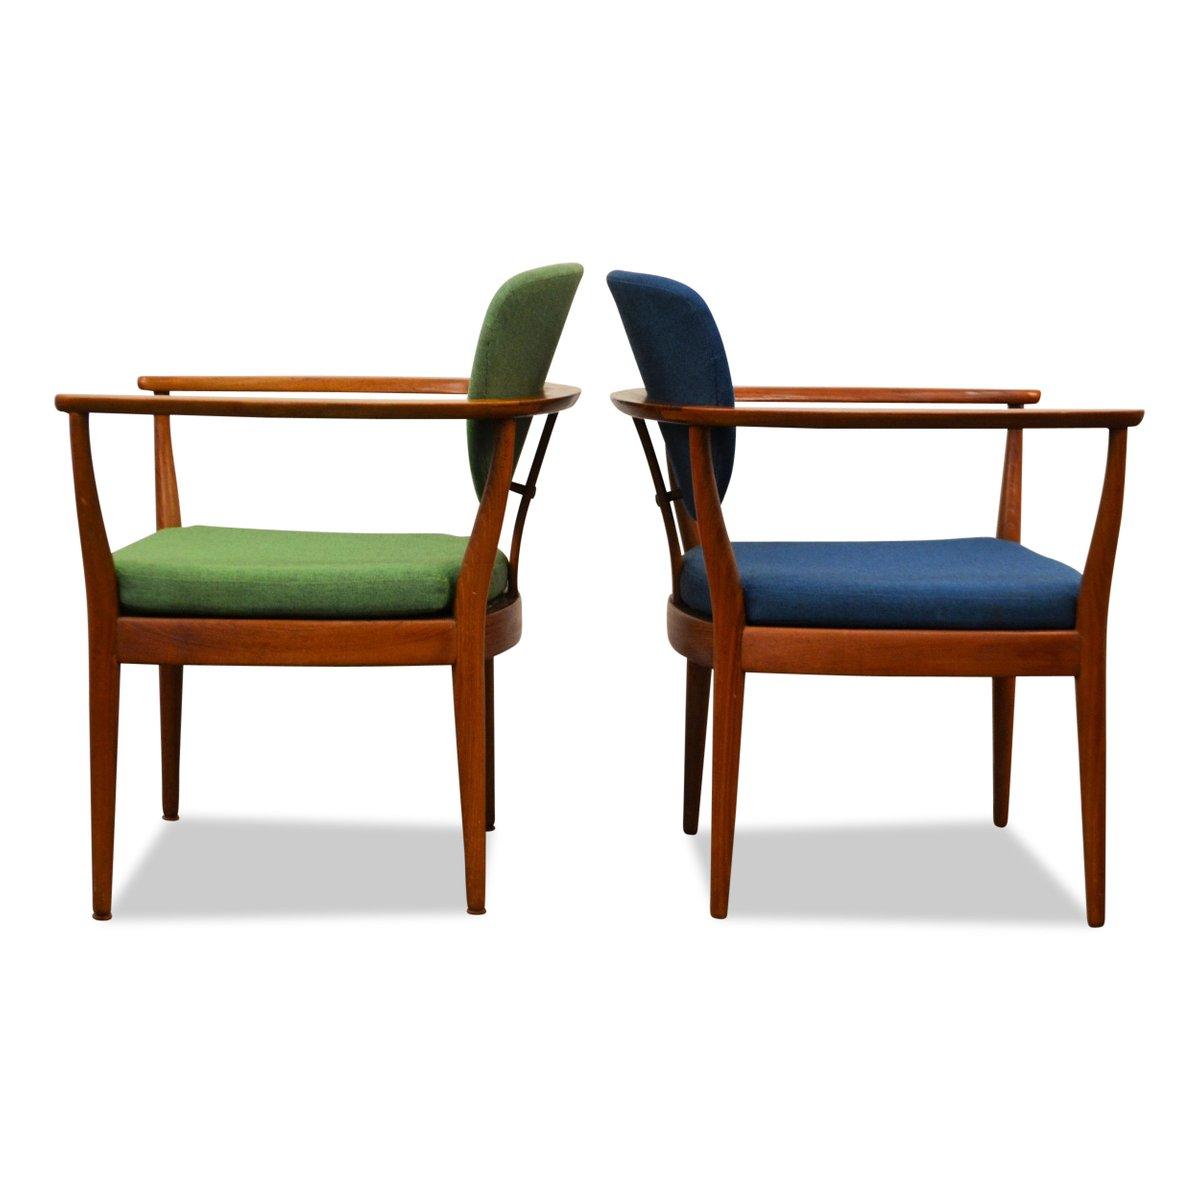 Teak Lounge Chairs - Price per set